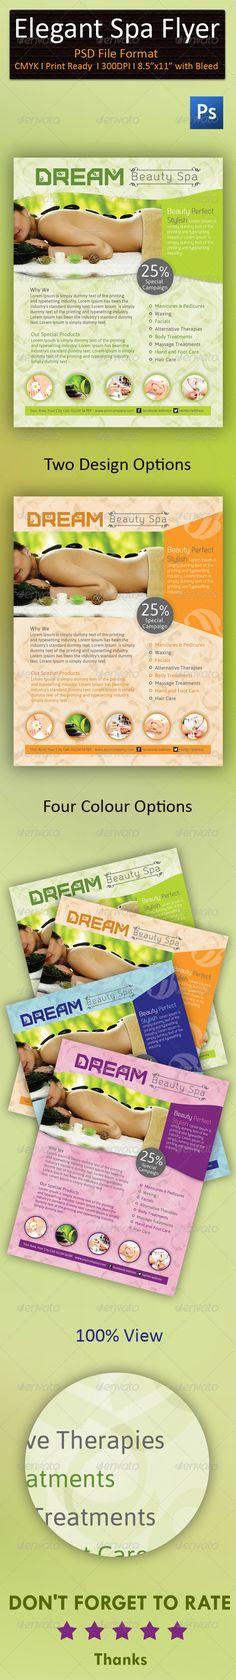 Elegant Spa/wellness Flyer